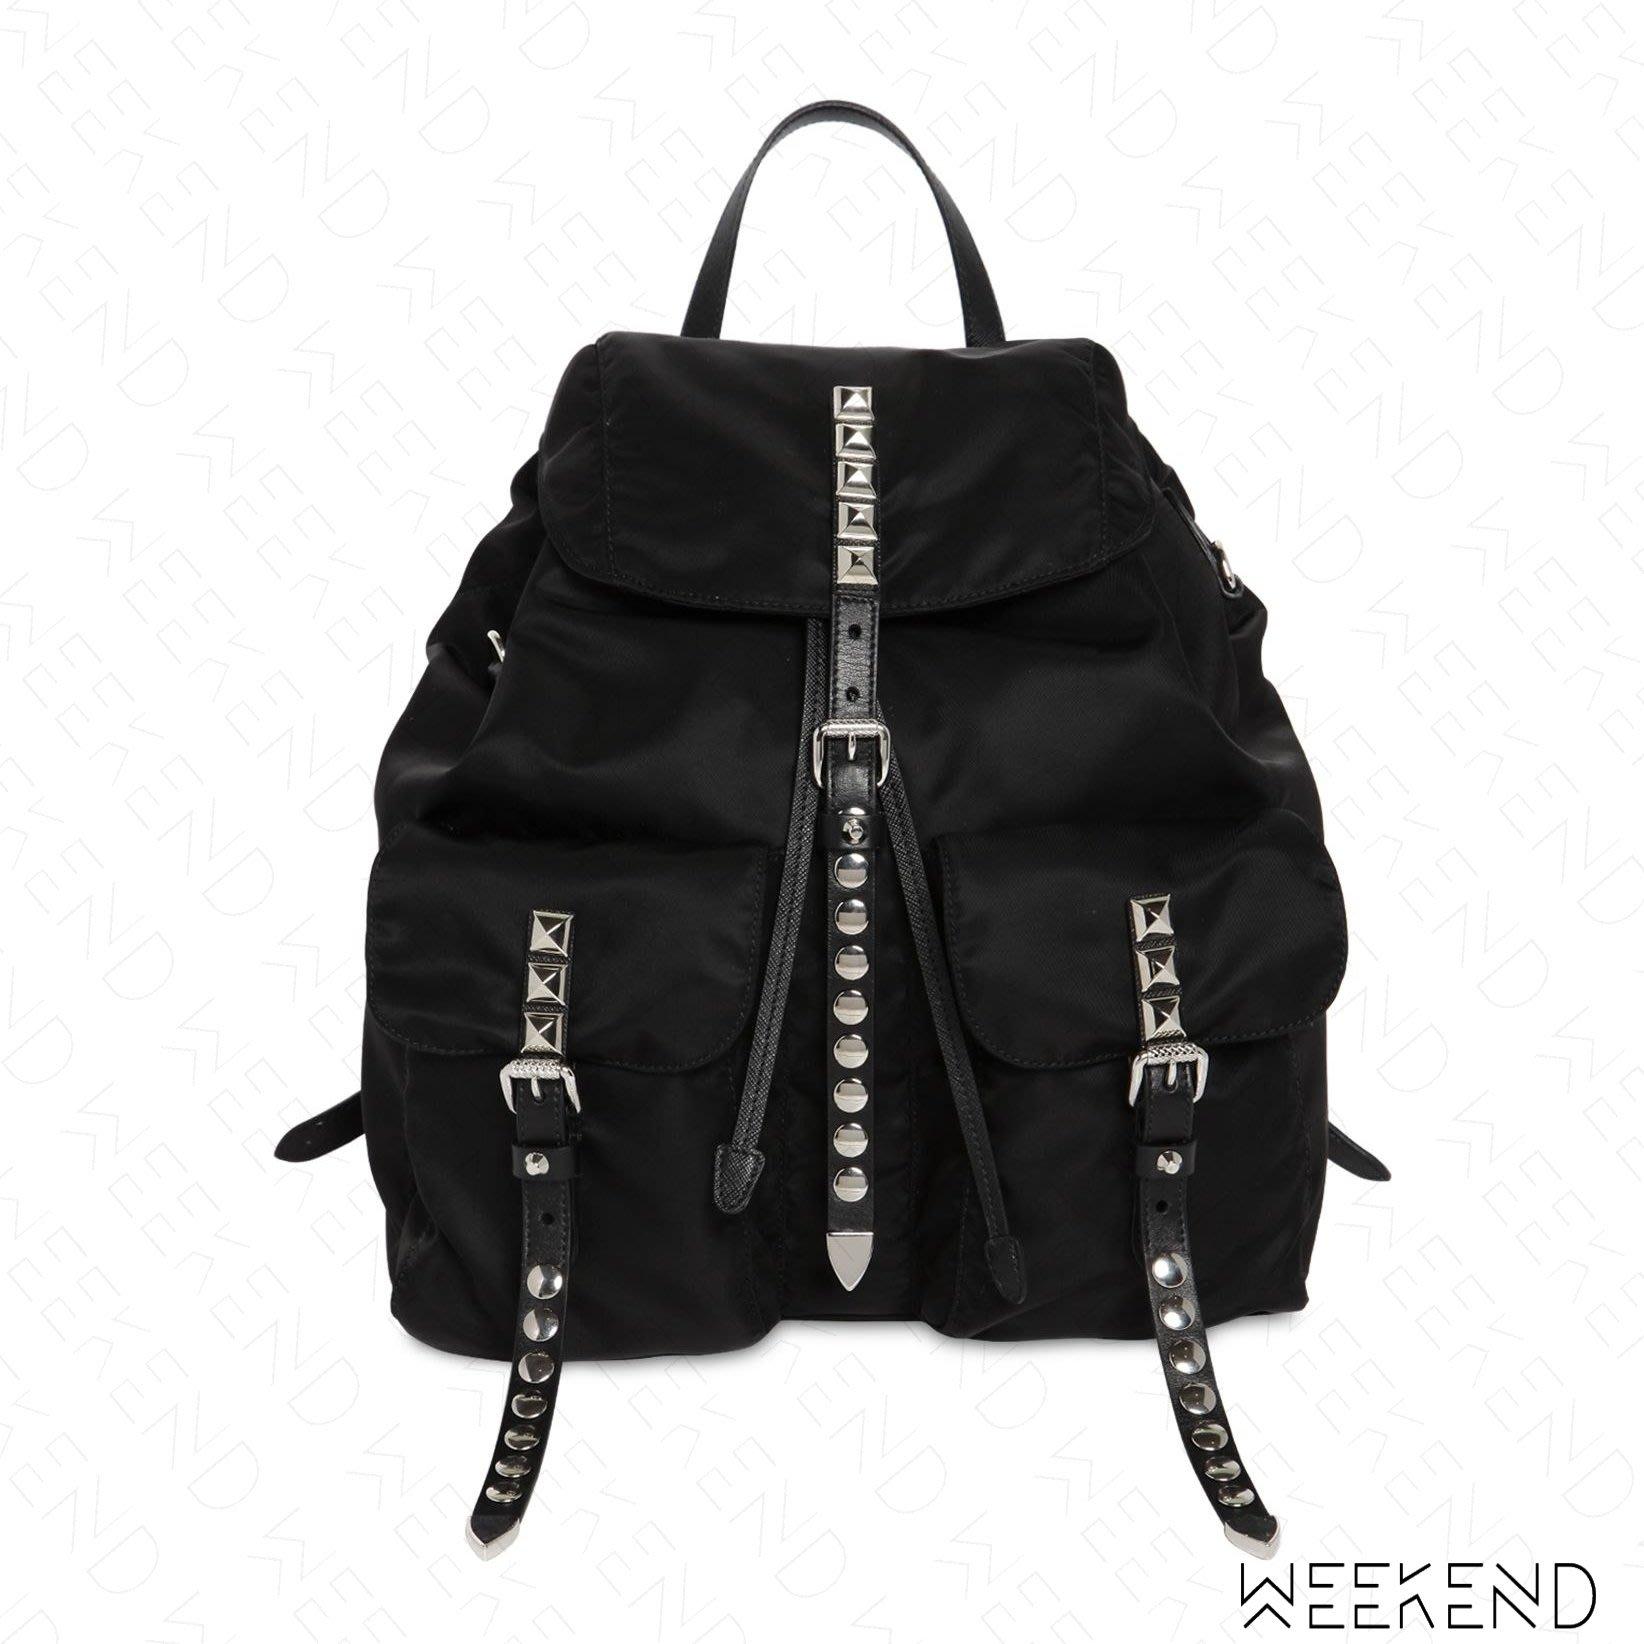 【WEEKEND】 PRADA Studded Logo 尼龍 鉚釘 扣帶 後背包 黑帶 黑色